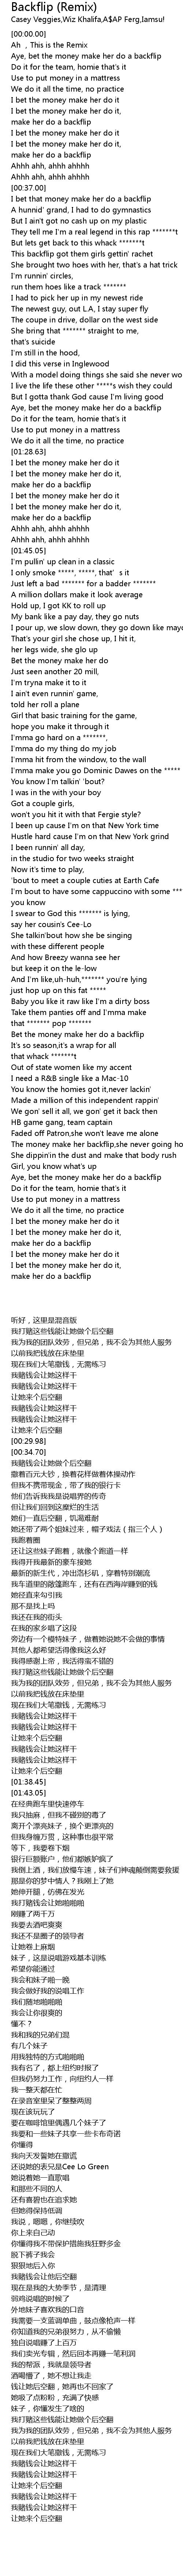 Bet cash money bet on me lyrics when is online sports betting legal